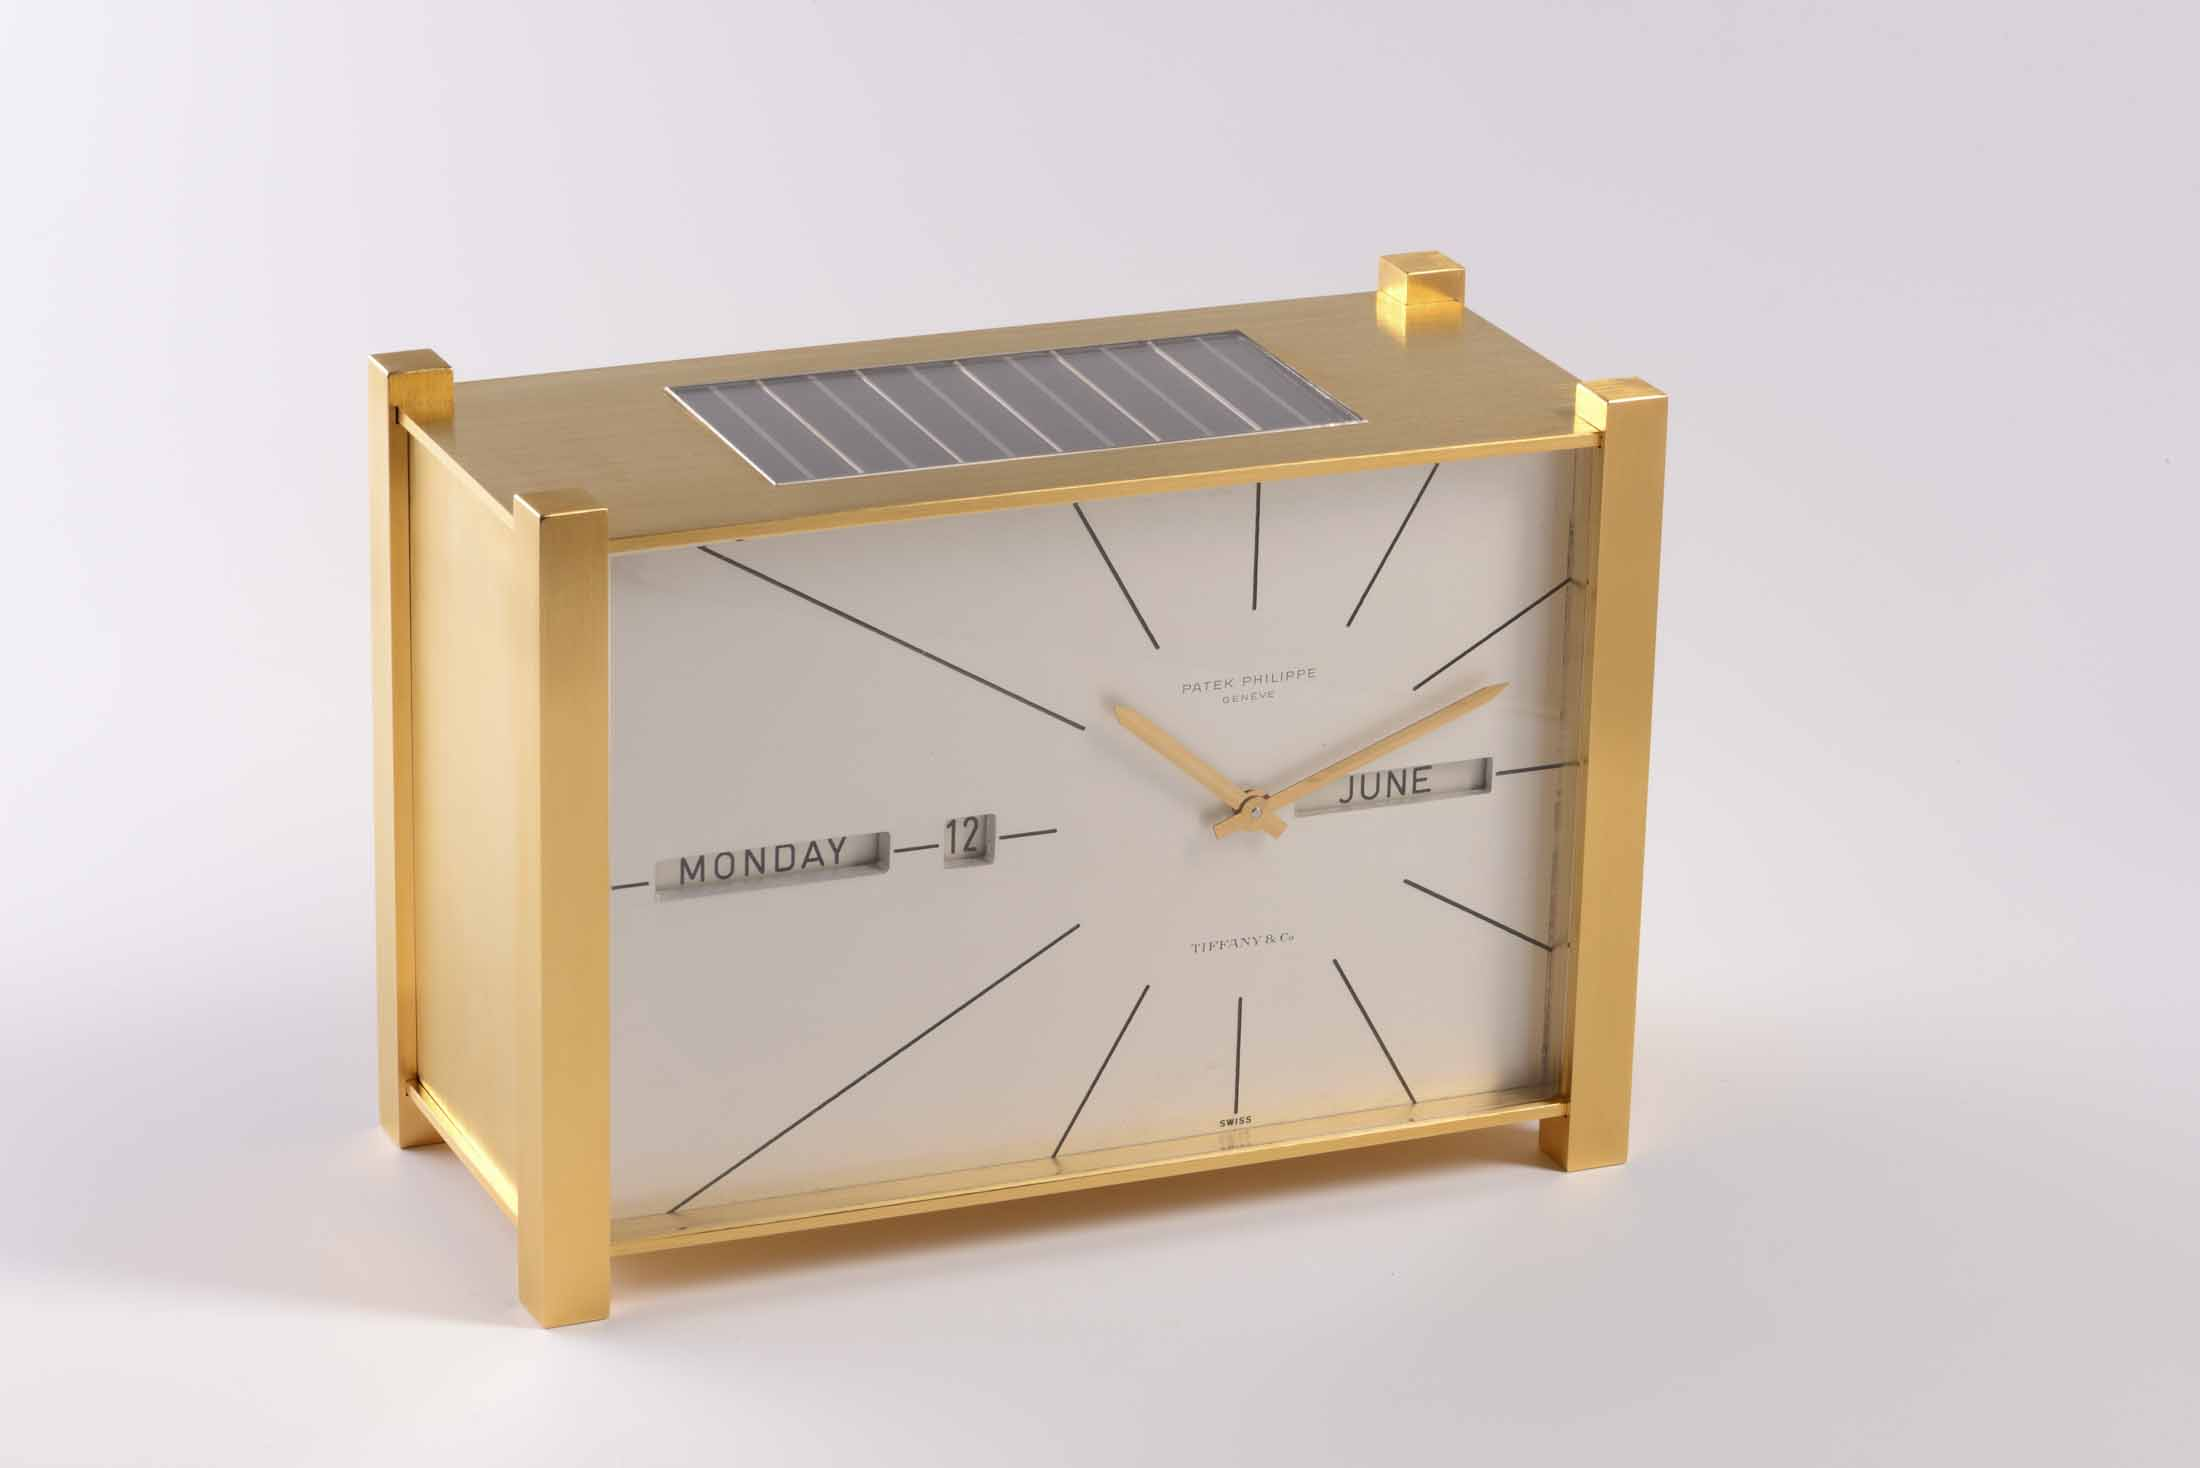 Patek Philippe Solar-Powered Clock With Full Perpetual Calendar